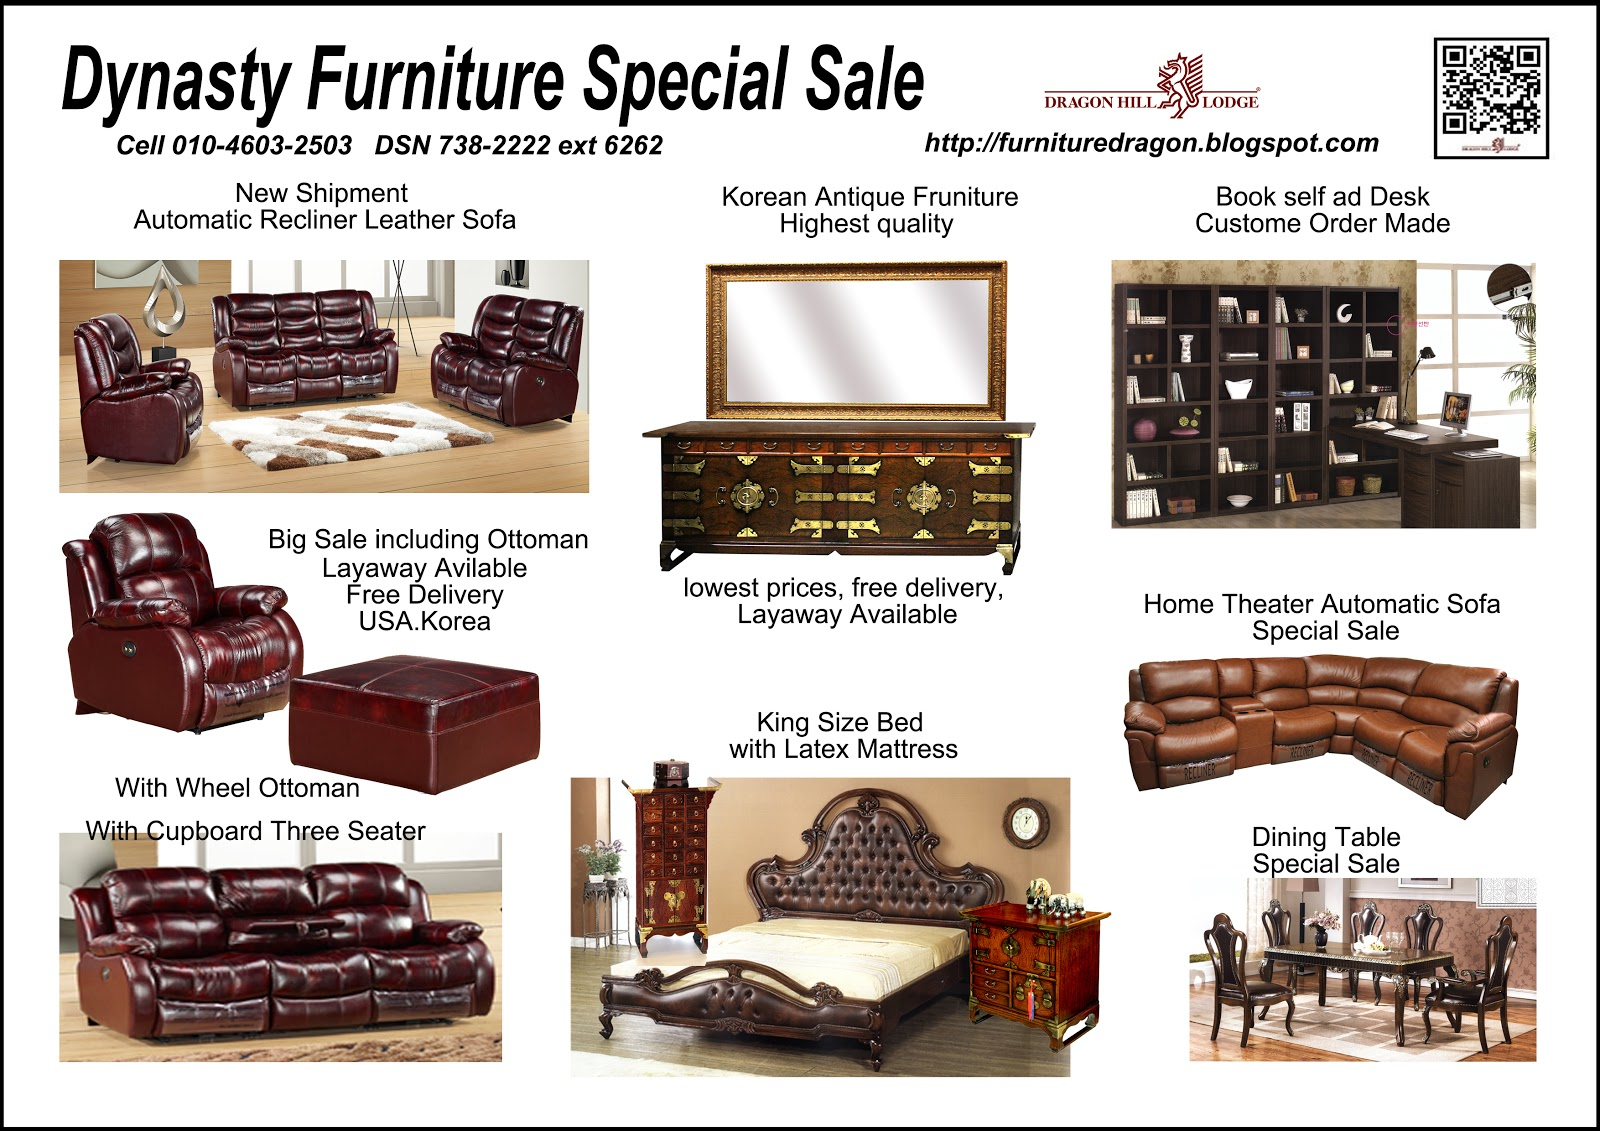 Nov 11th Sale